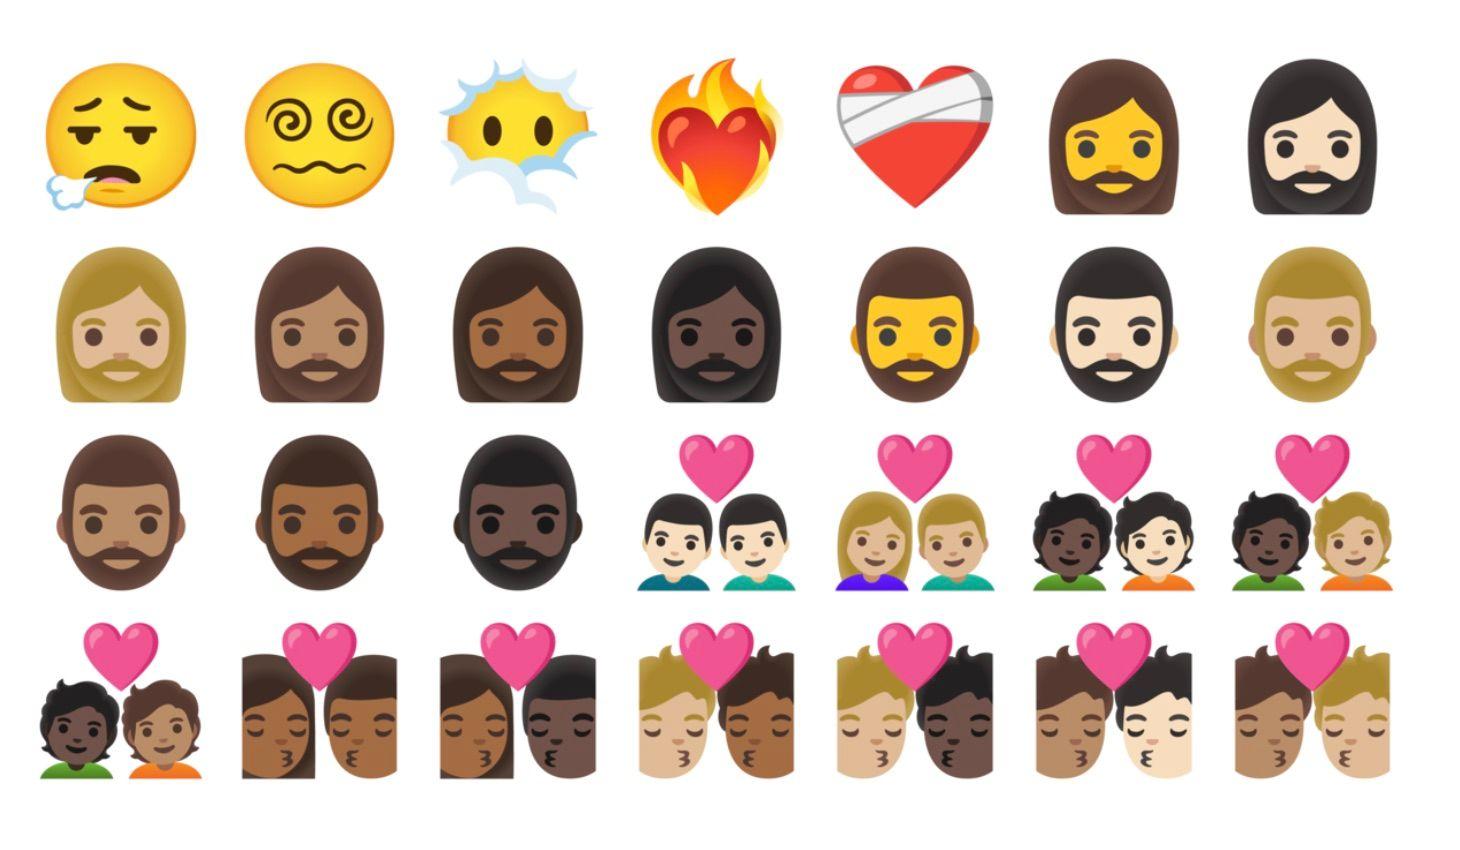 new-android-dec-2020-feature-drop-emoji-13-1-emojipedia